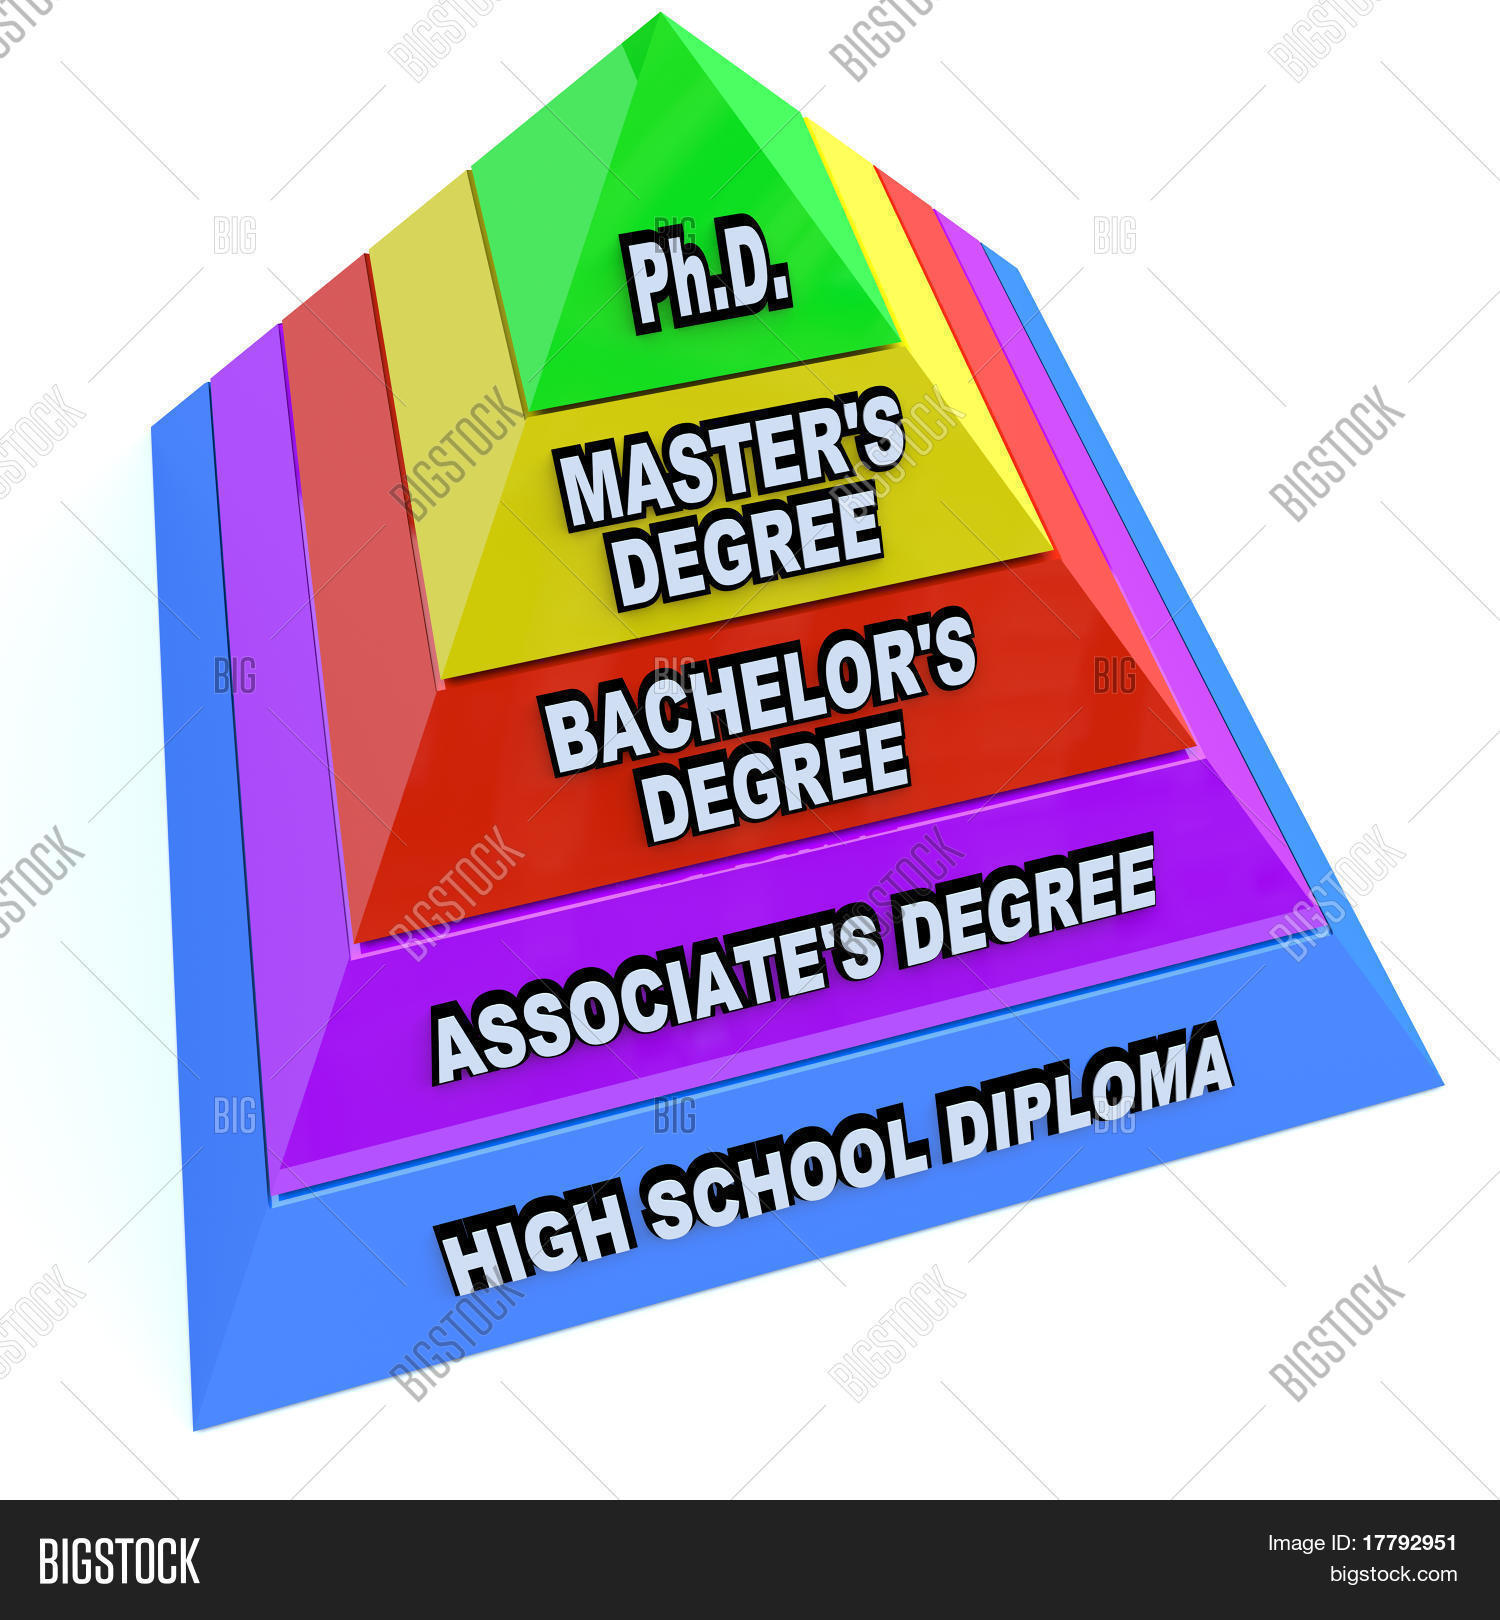 Masters degree level for Level master